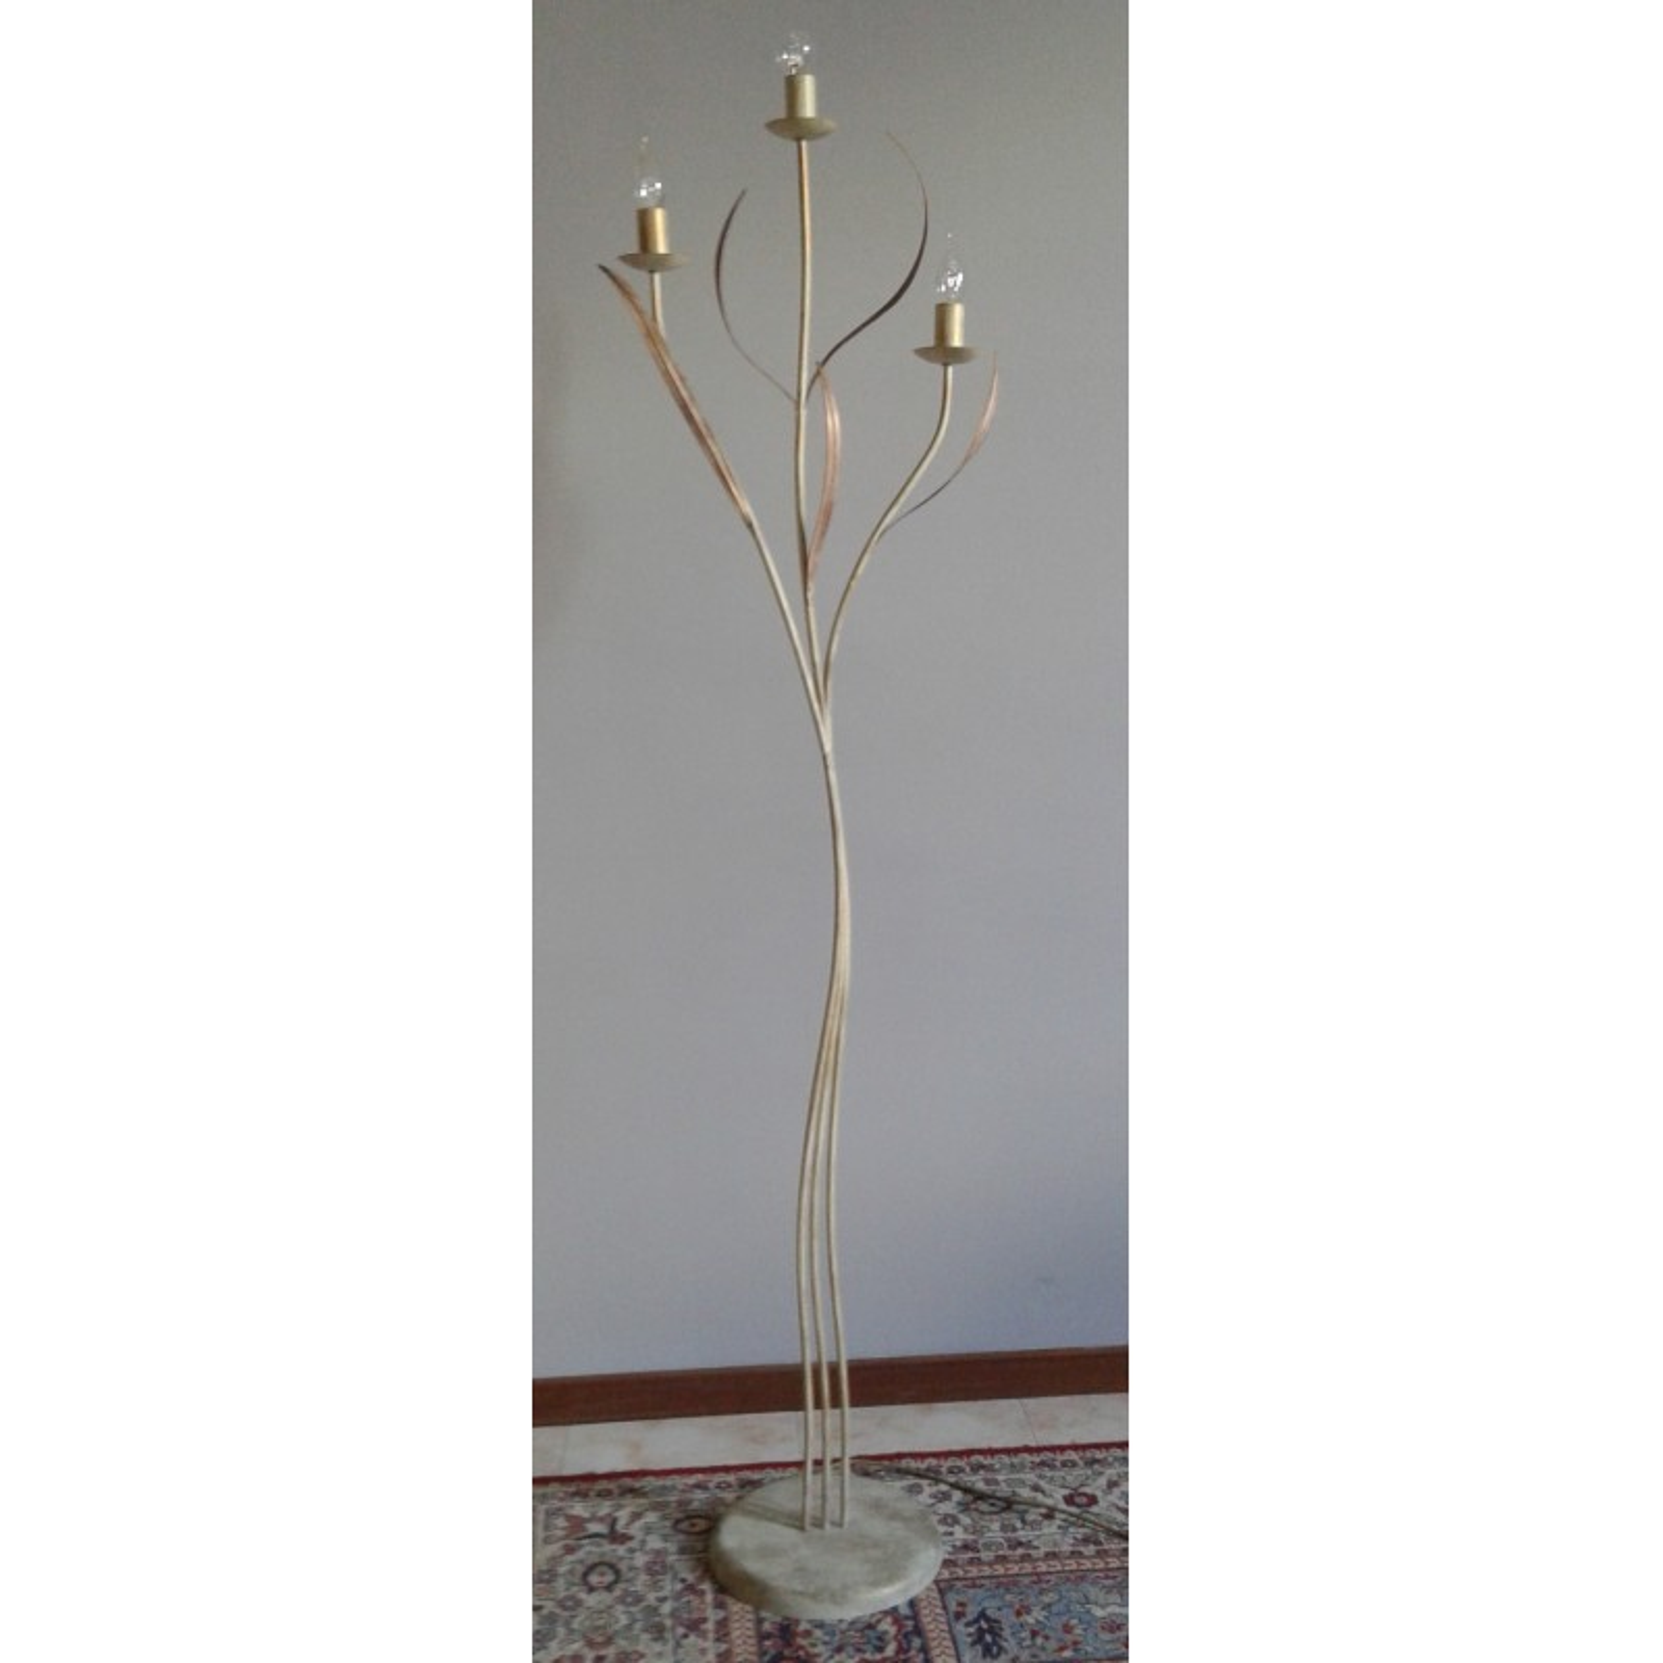 https://www.vaccarielettrocasa.it/4003-thickbox_default/lampada-piantana-a-candelabro-lampada-a-vista.jpg